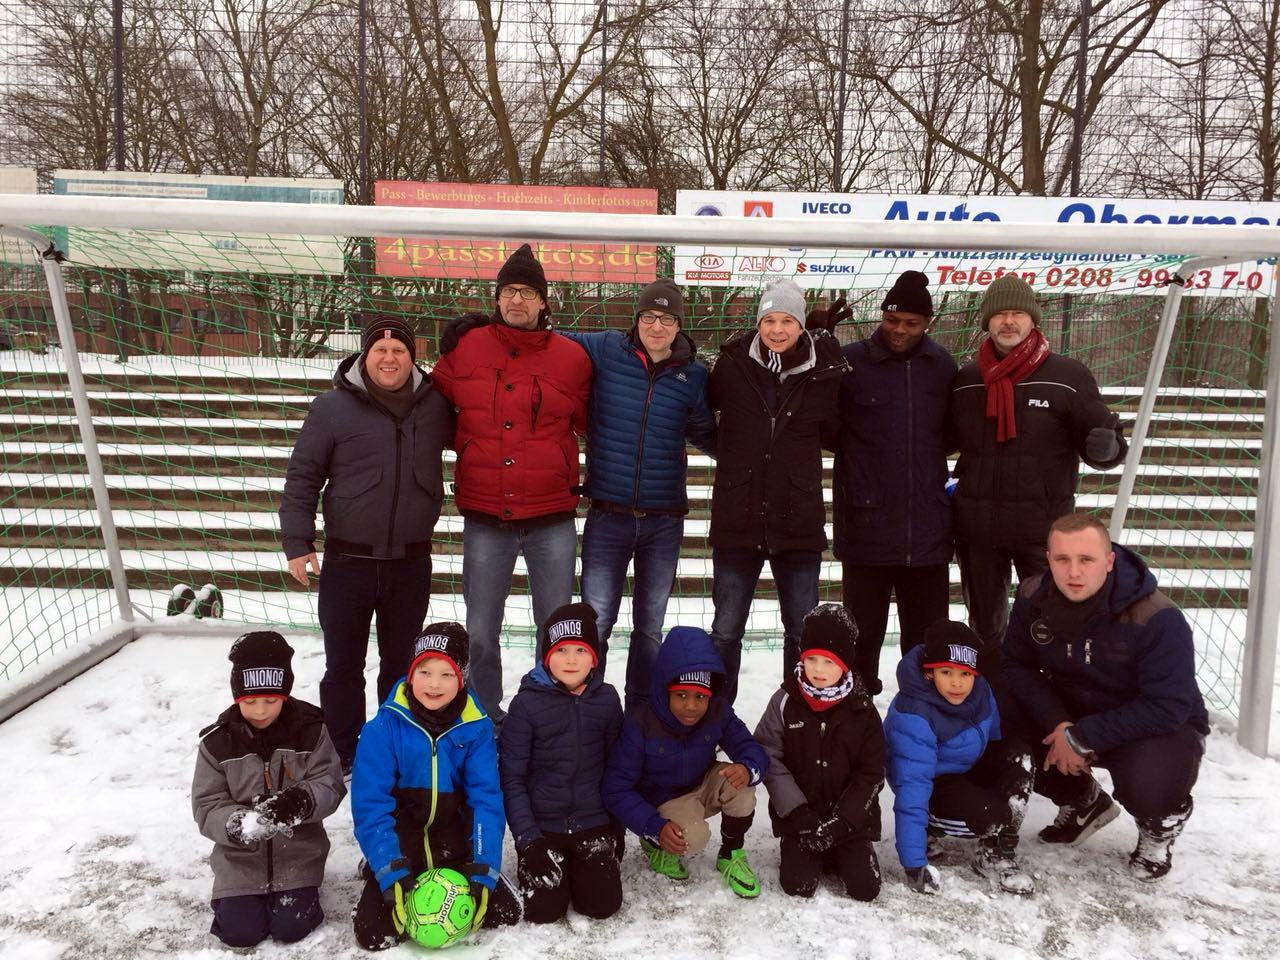 Bambini – Trotz Ausfall des Spiels – Spaß im Schnee